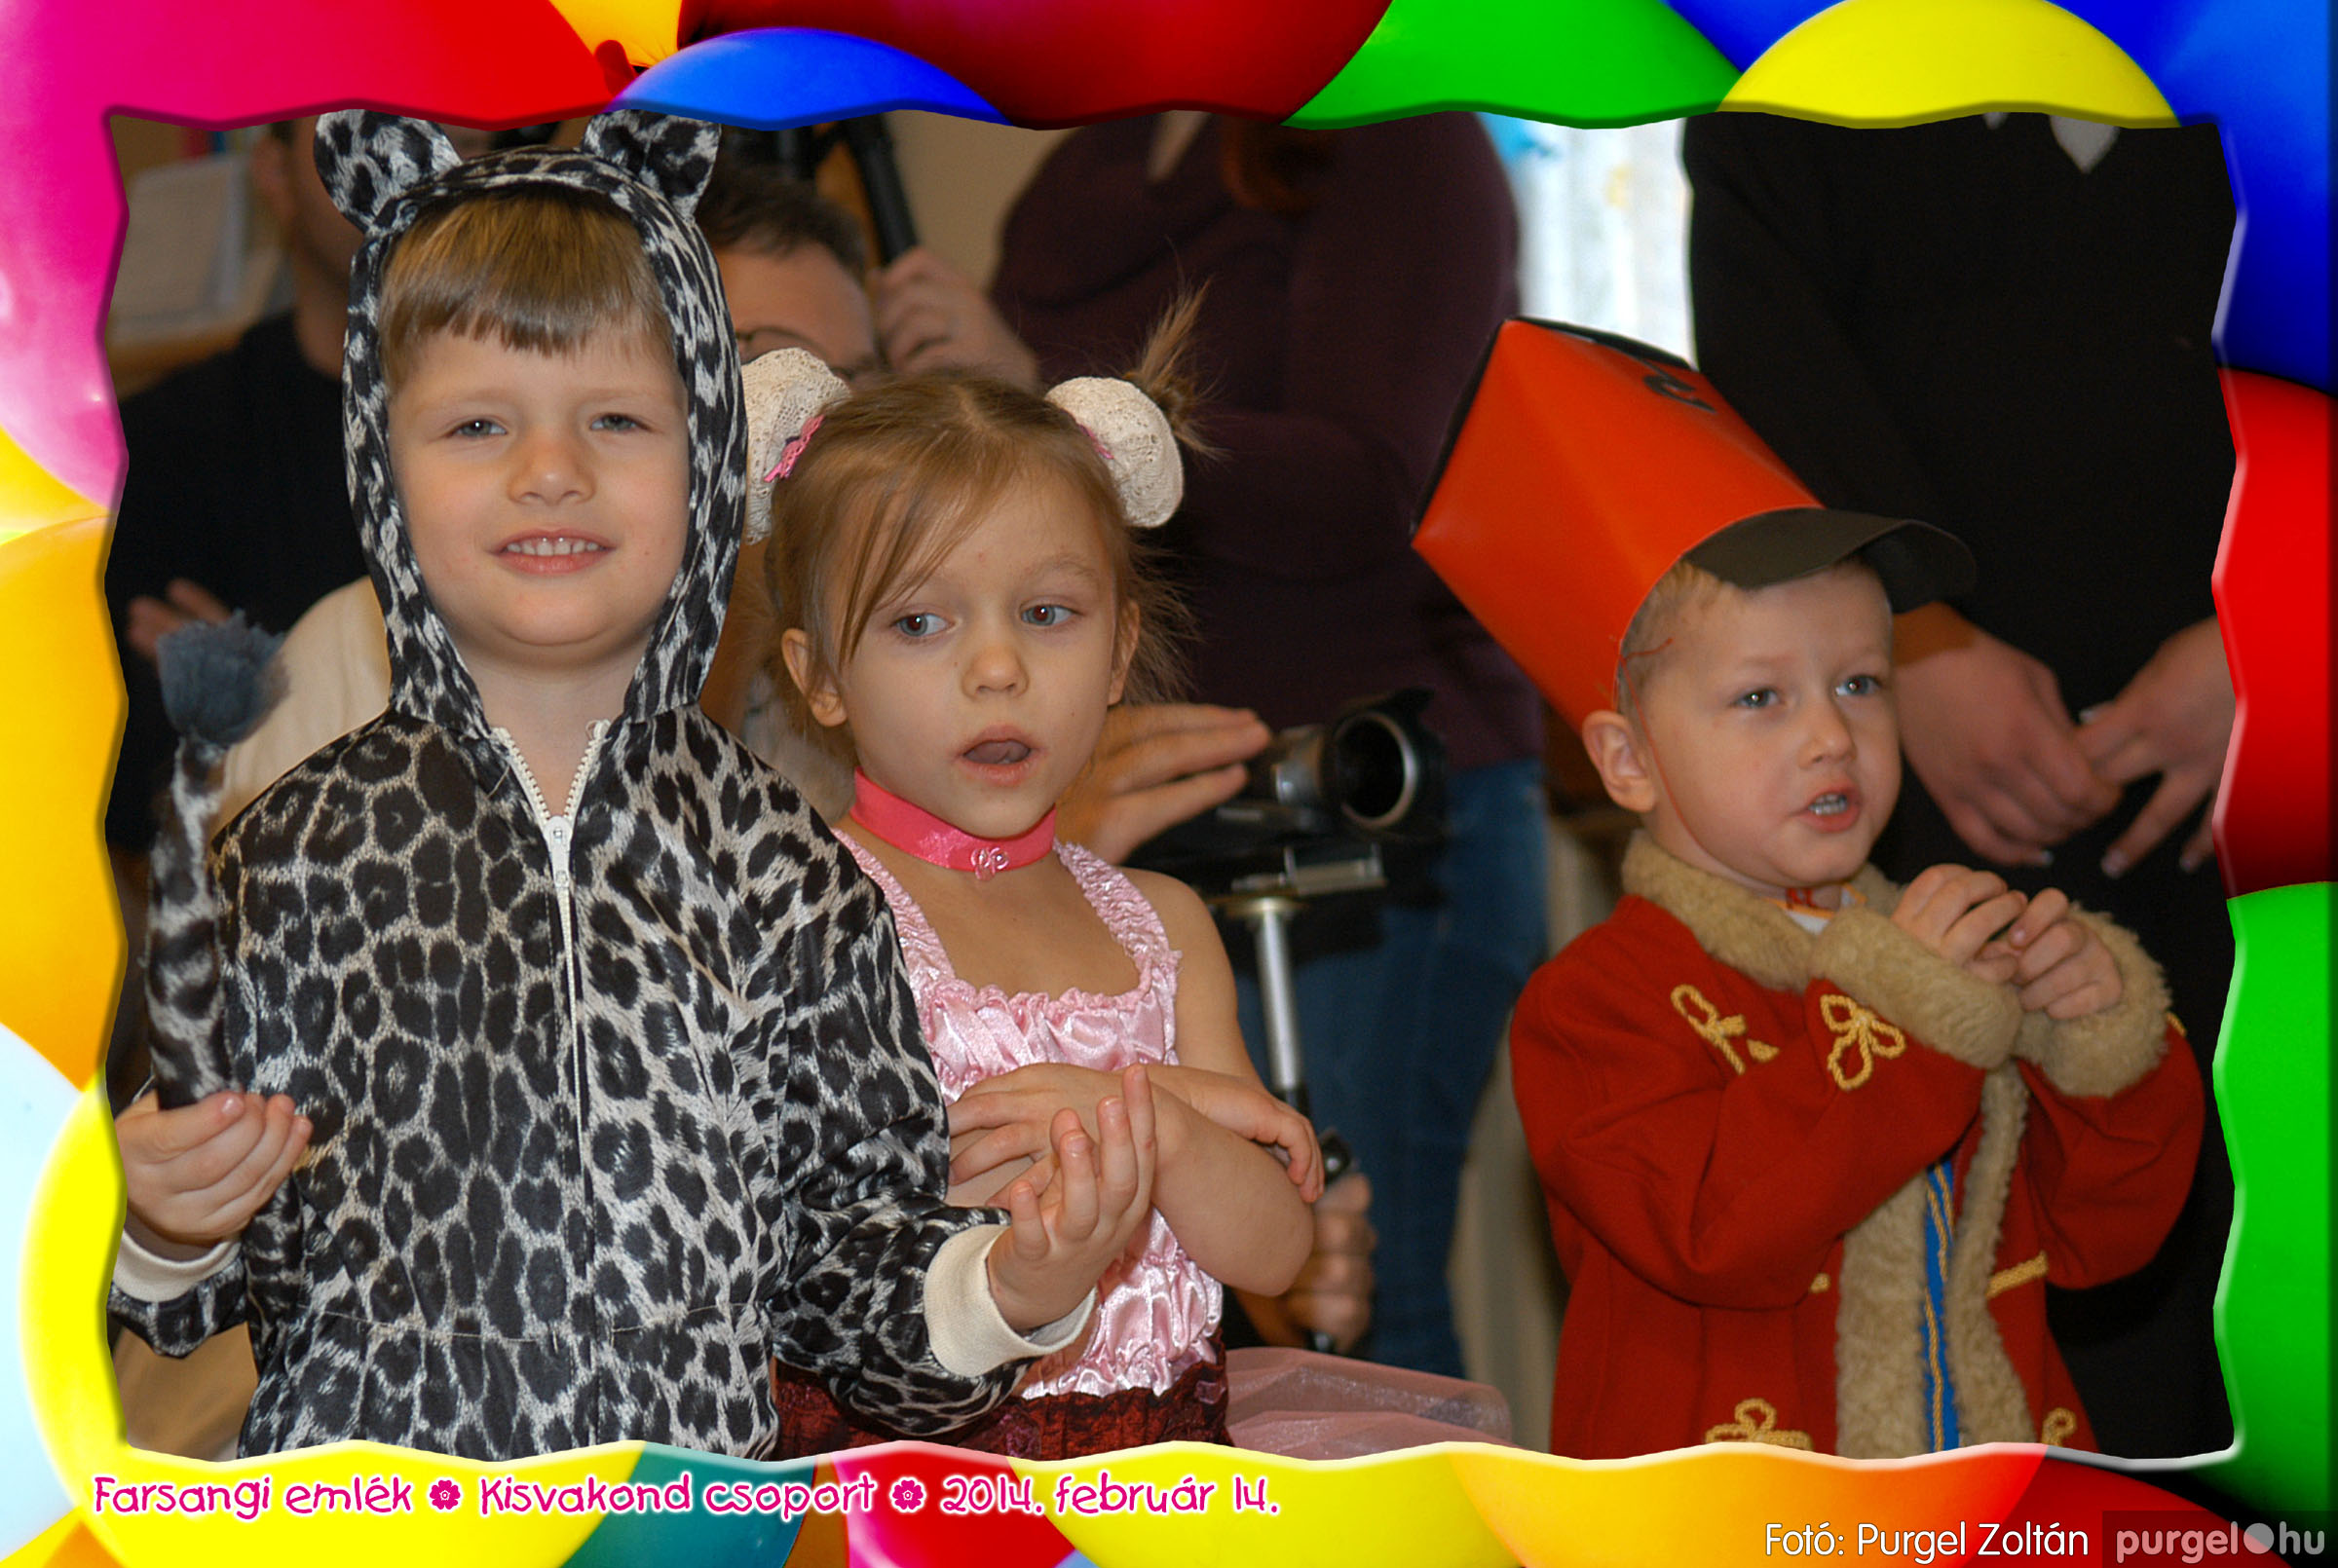 2014.02.14. 183 Kurca-parti Óvoda farsang 2014. - Kisvakond csoport - Fotó:PURGEL ZOLTÁN© 403.jpg